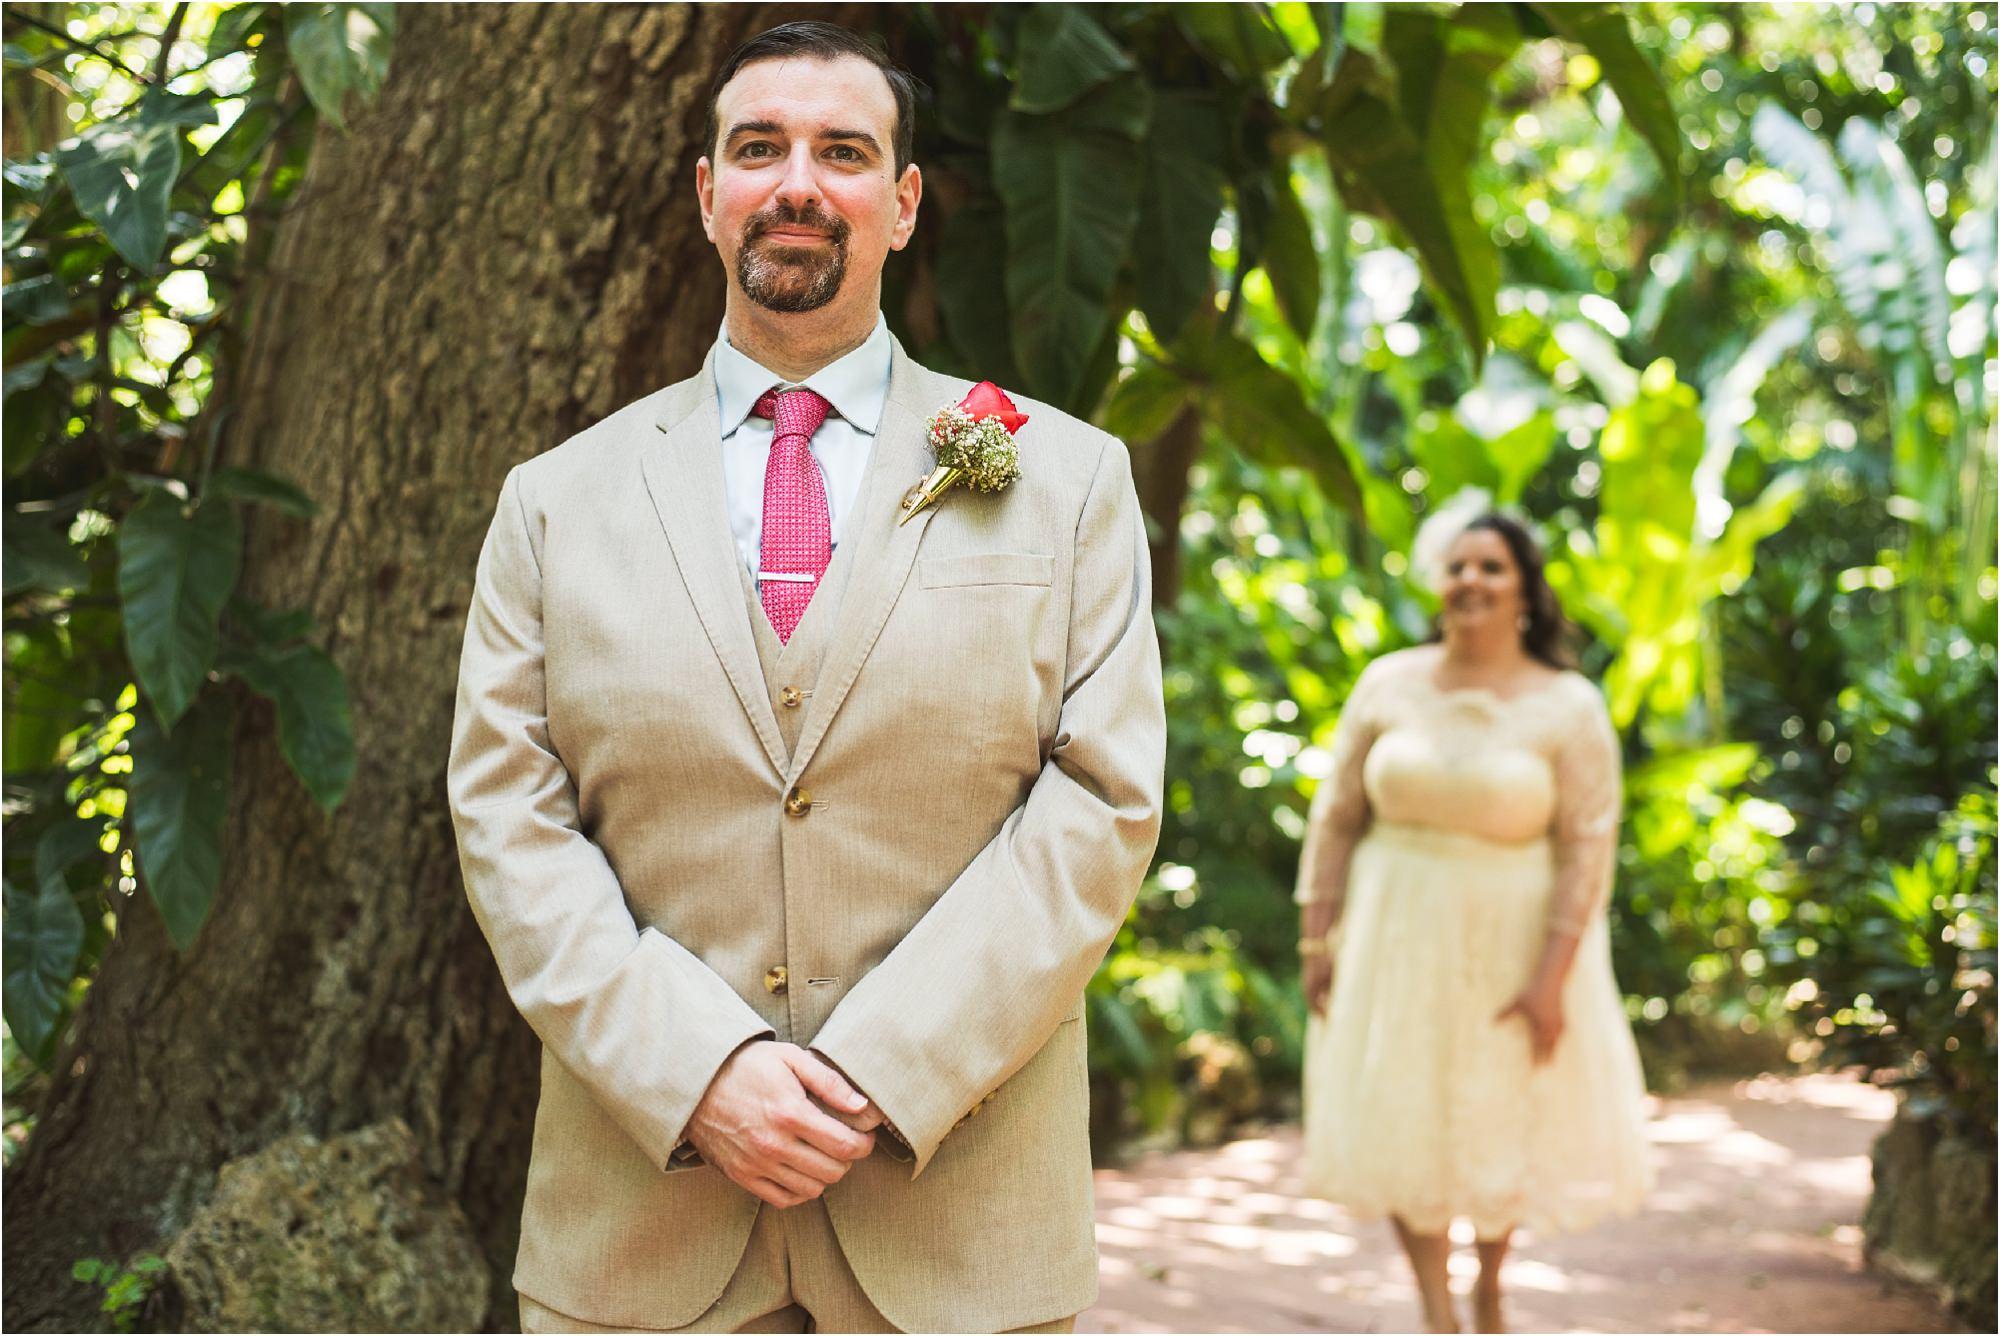 outdoor-rustic-pincrest-gardens-wedding-miami-photographer-jessenia-gonzalez_1009.jpg